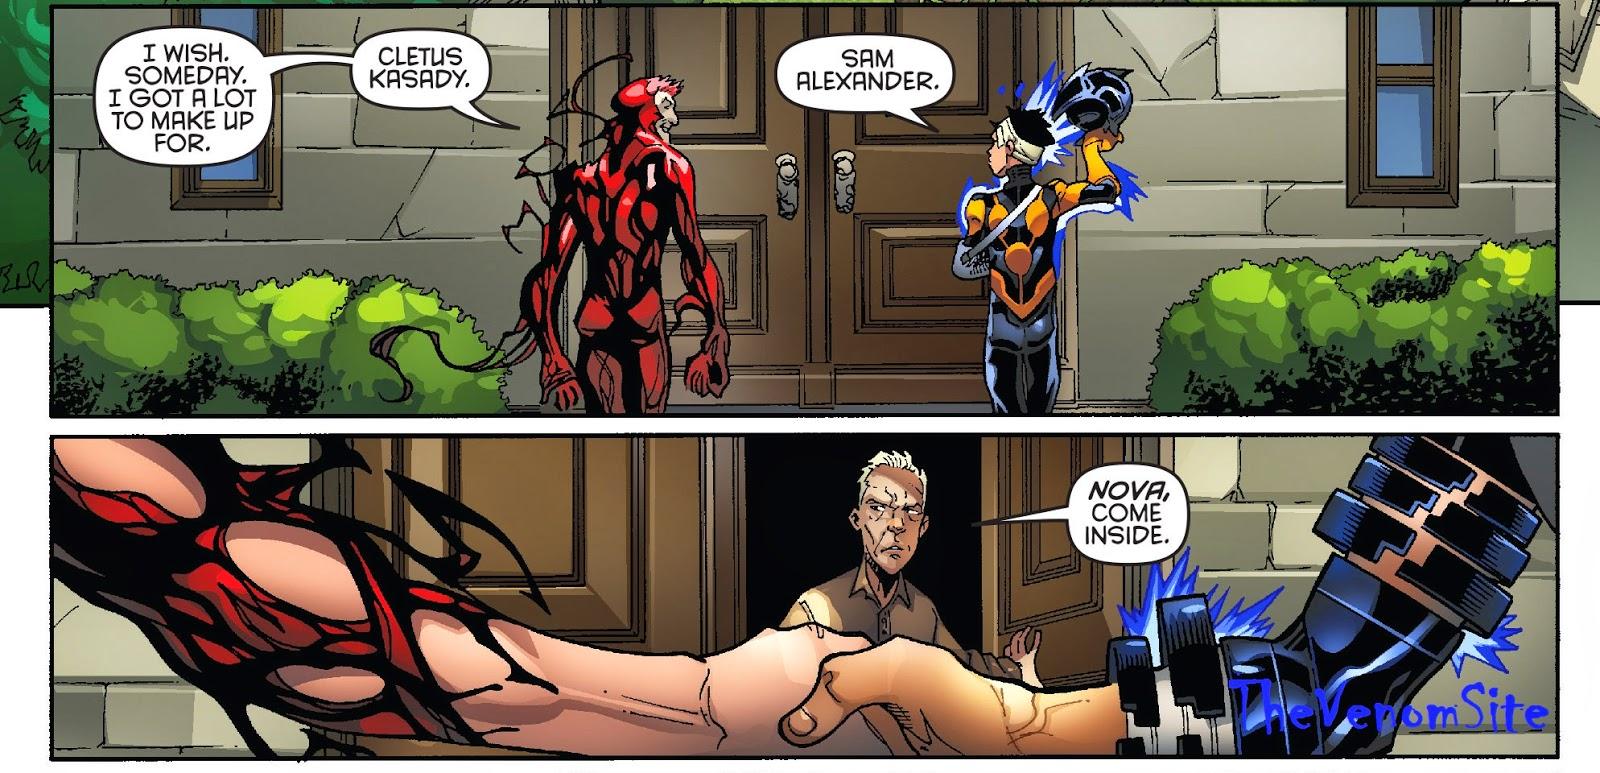 Follow Nova's comic book series for future cameos of Carnage